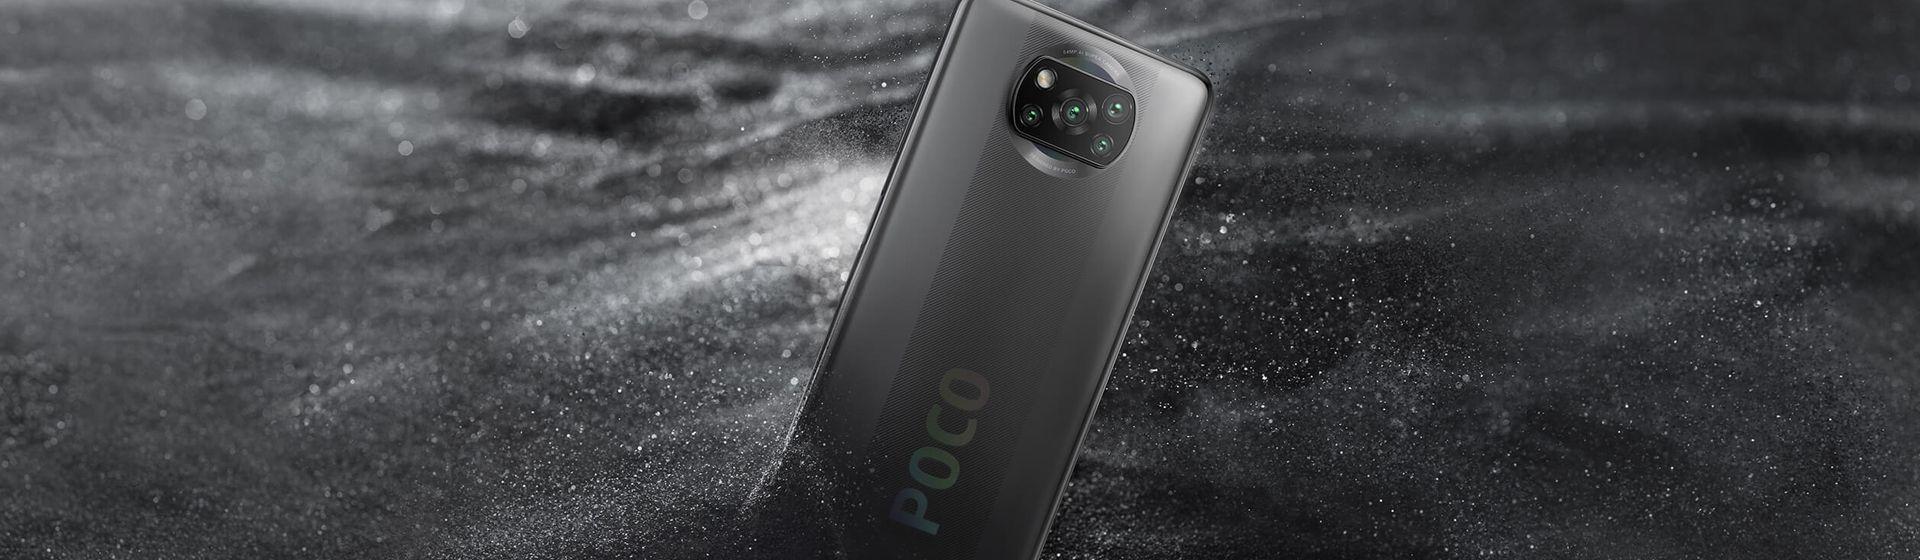 Xiaomi anuncia a chegada do POCO X3 NFC no Brasil